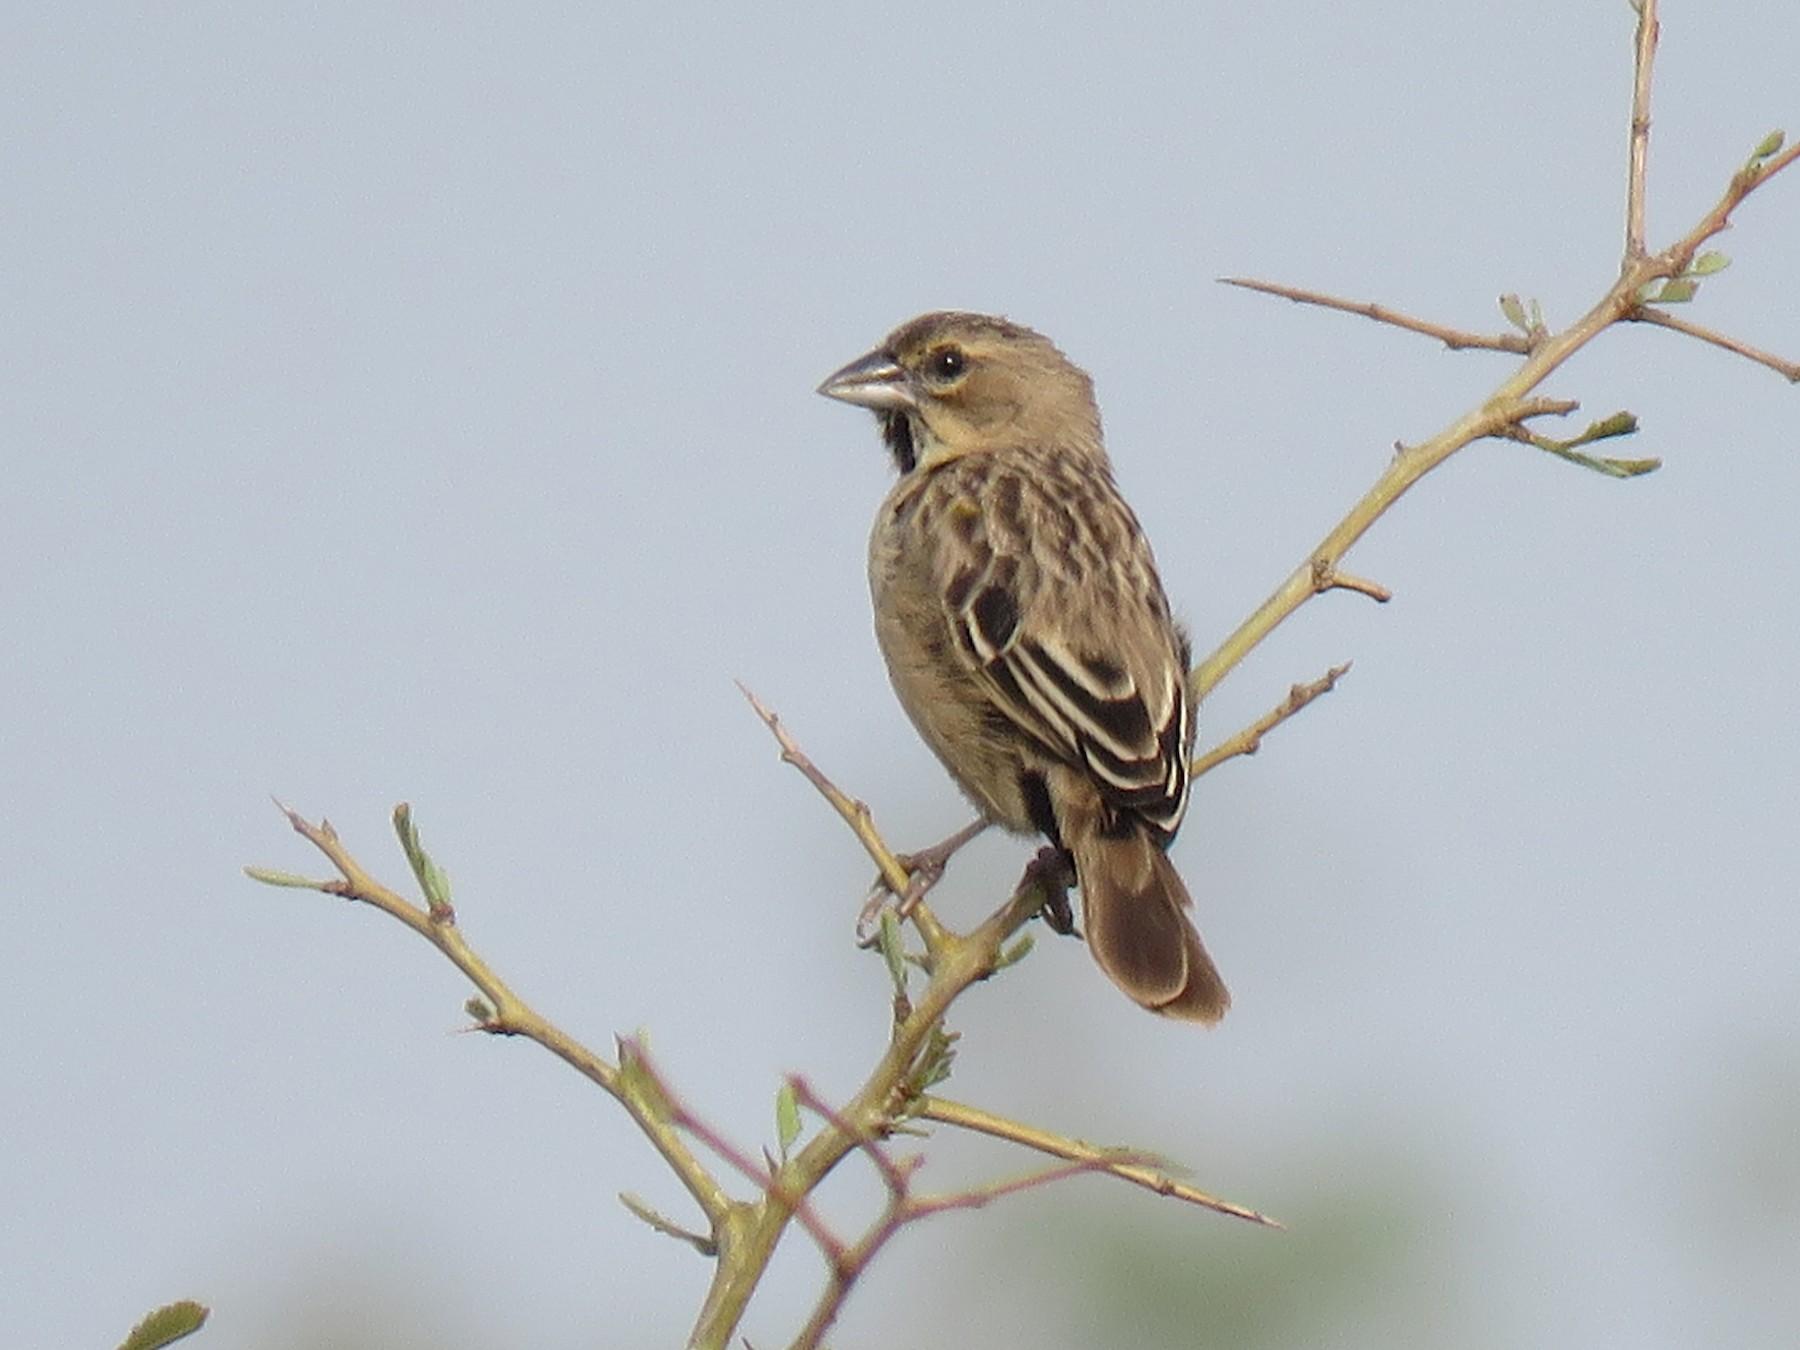 Yellow-mantled Widowbird - Jose Estrada